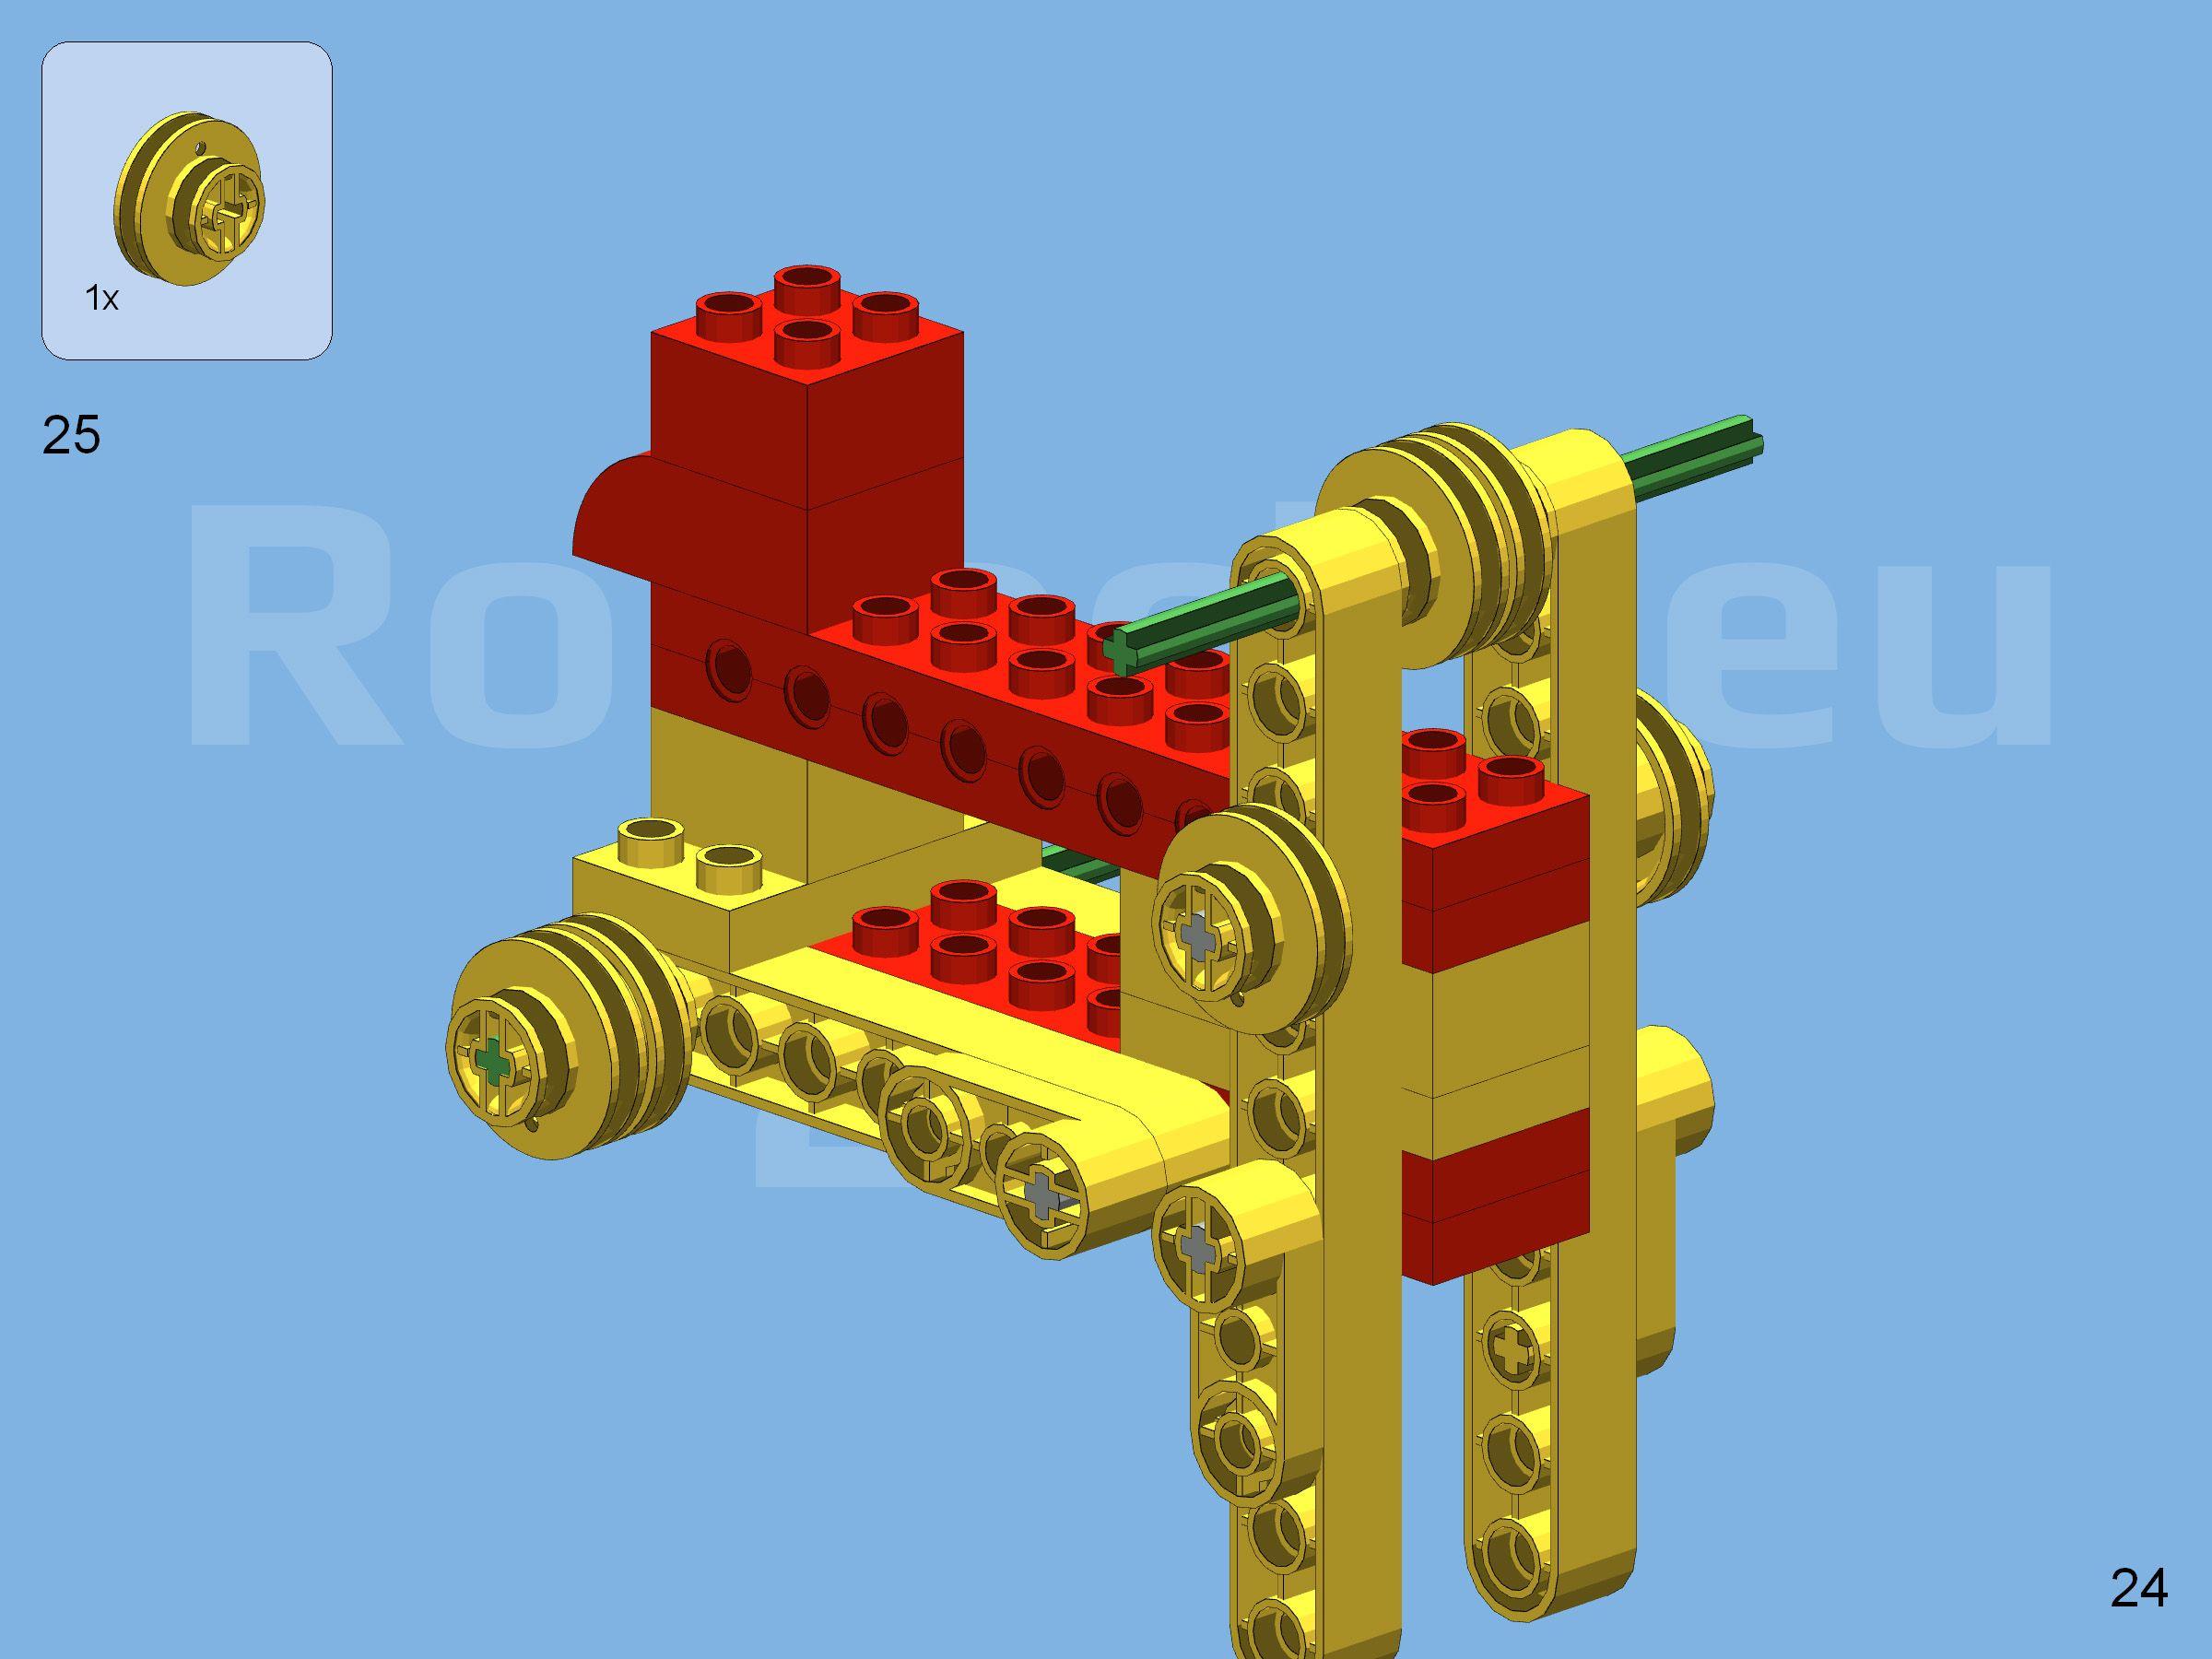 LEGO Duplo Early Simple Machines Bike | Robocik.eu